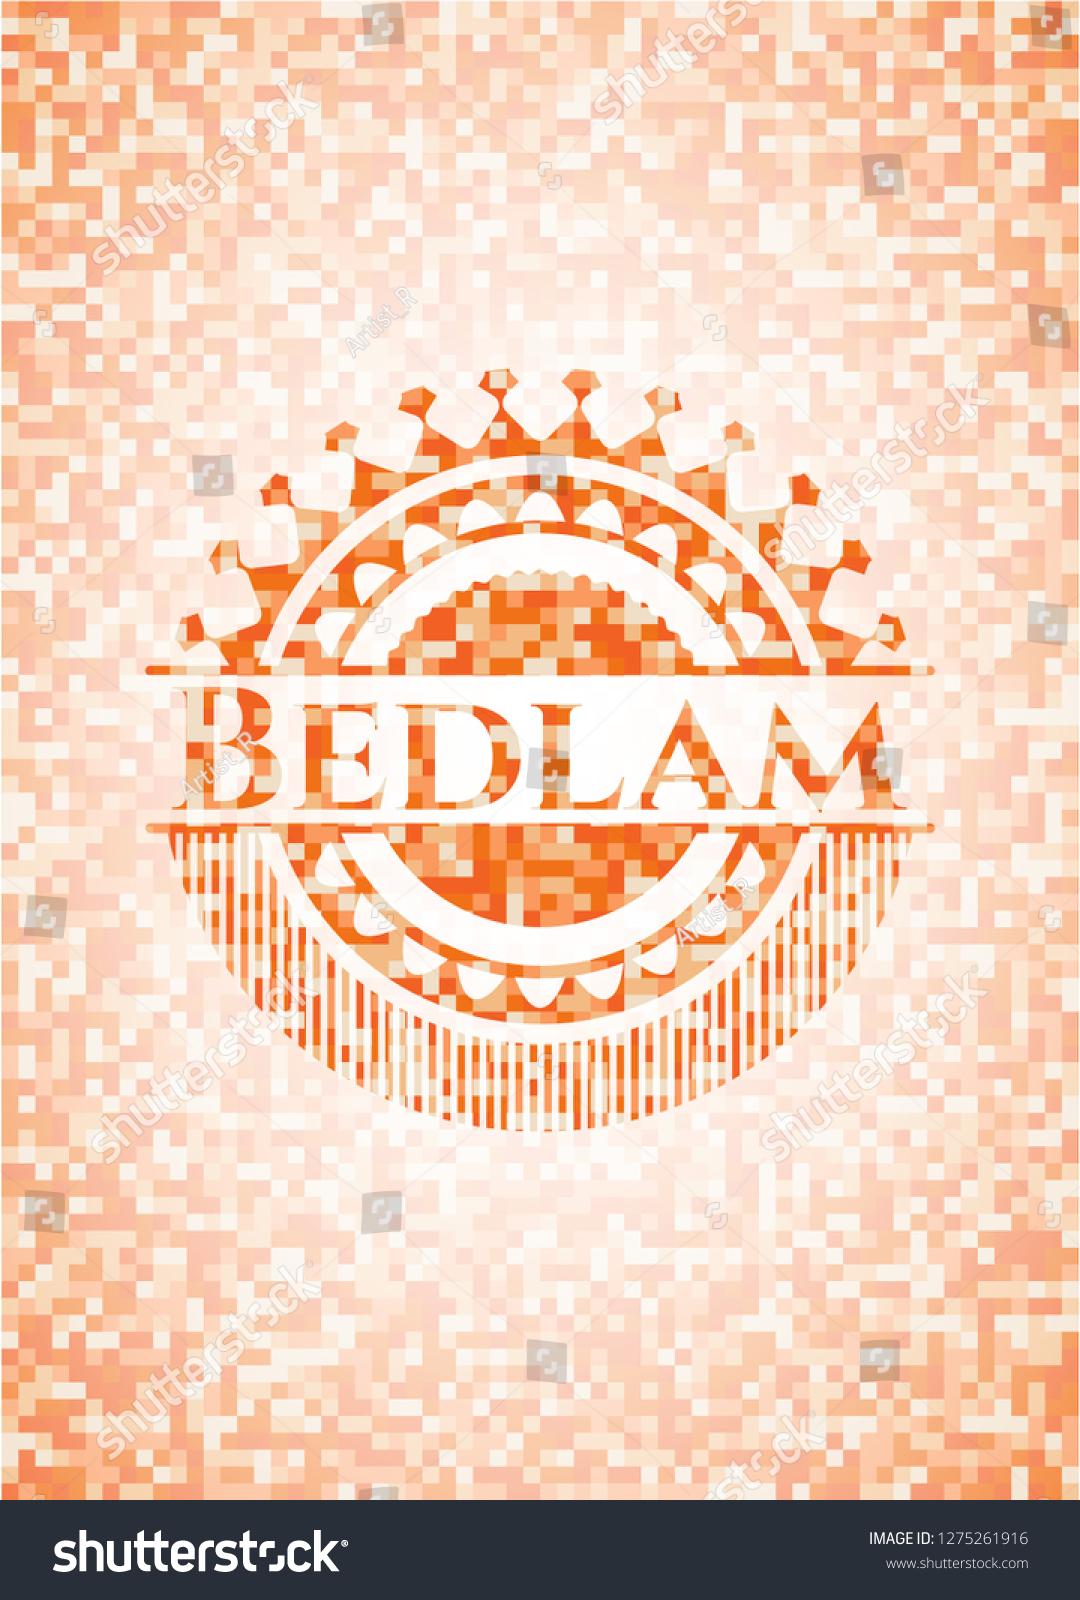 Bedlam Orange Mosaic Emblem Background Stock Vector Royalty 1080x1600